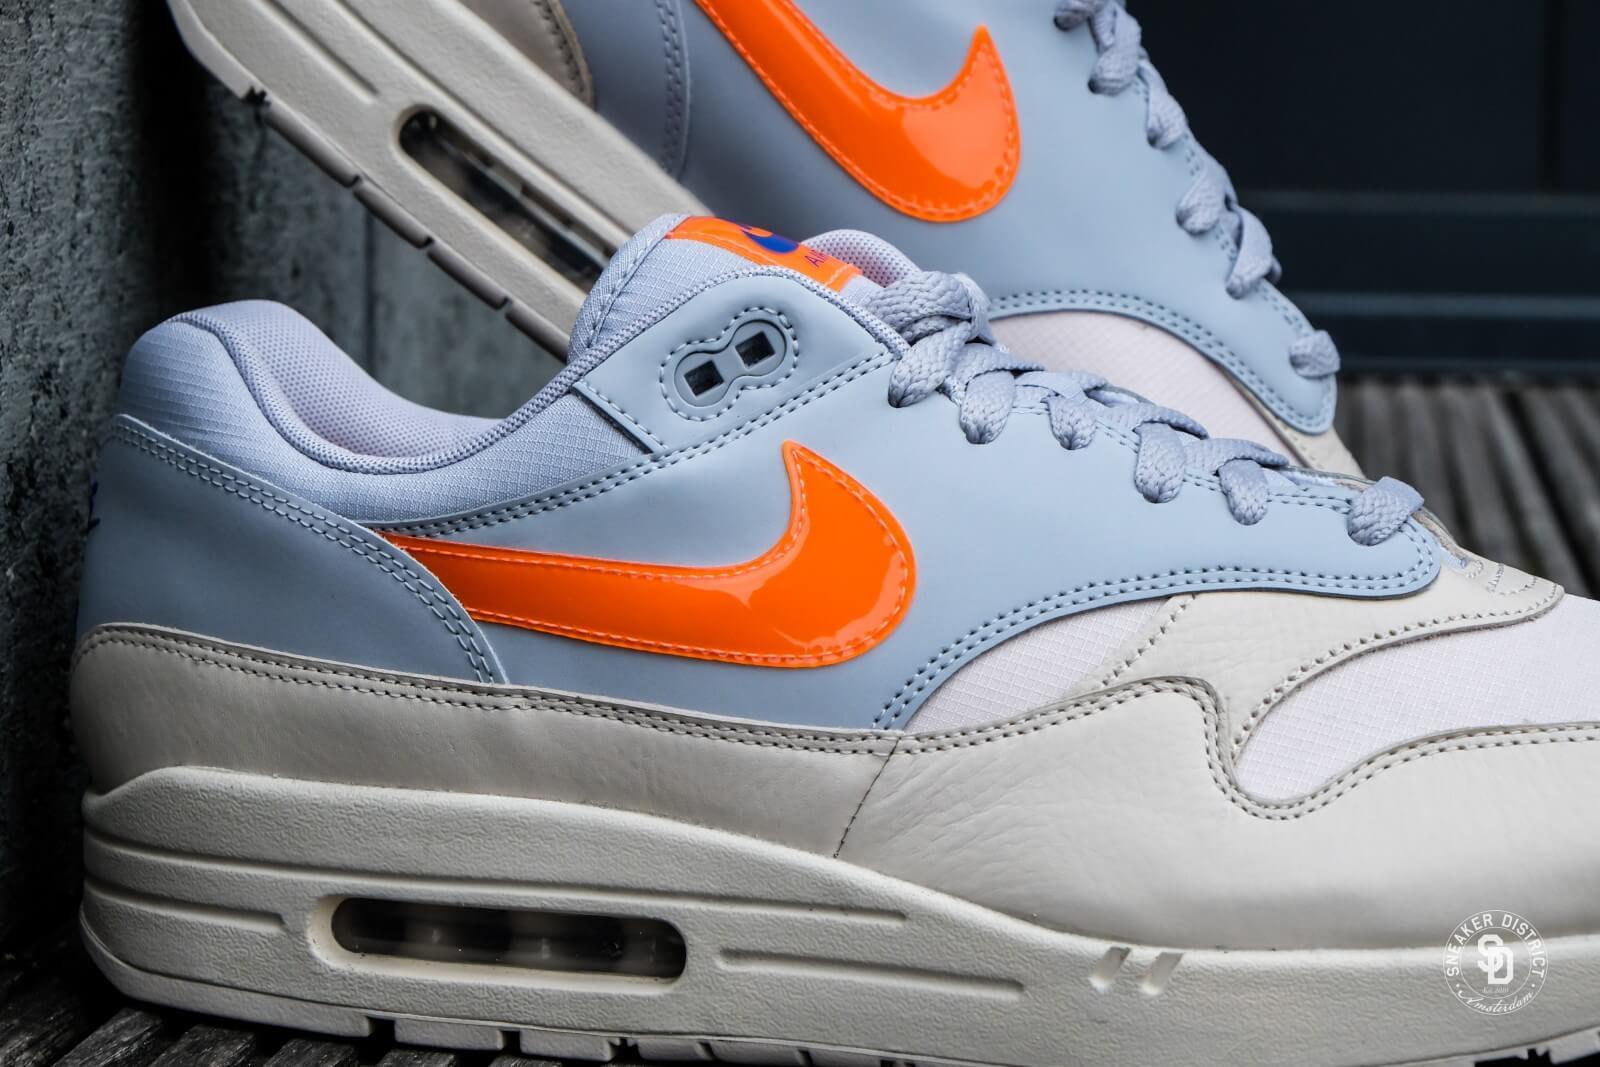 nike air max 1 blue grey orange